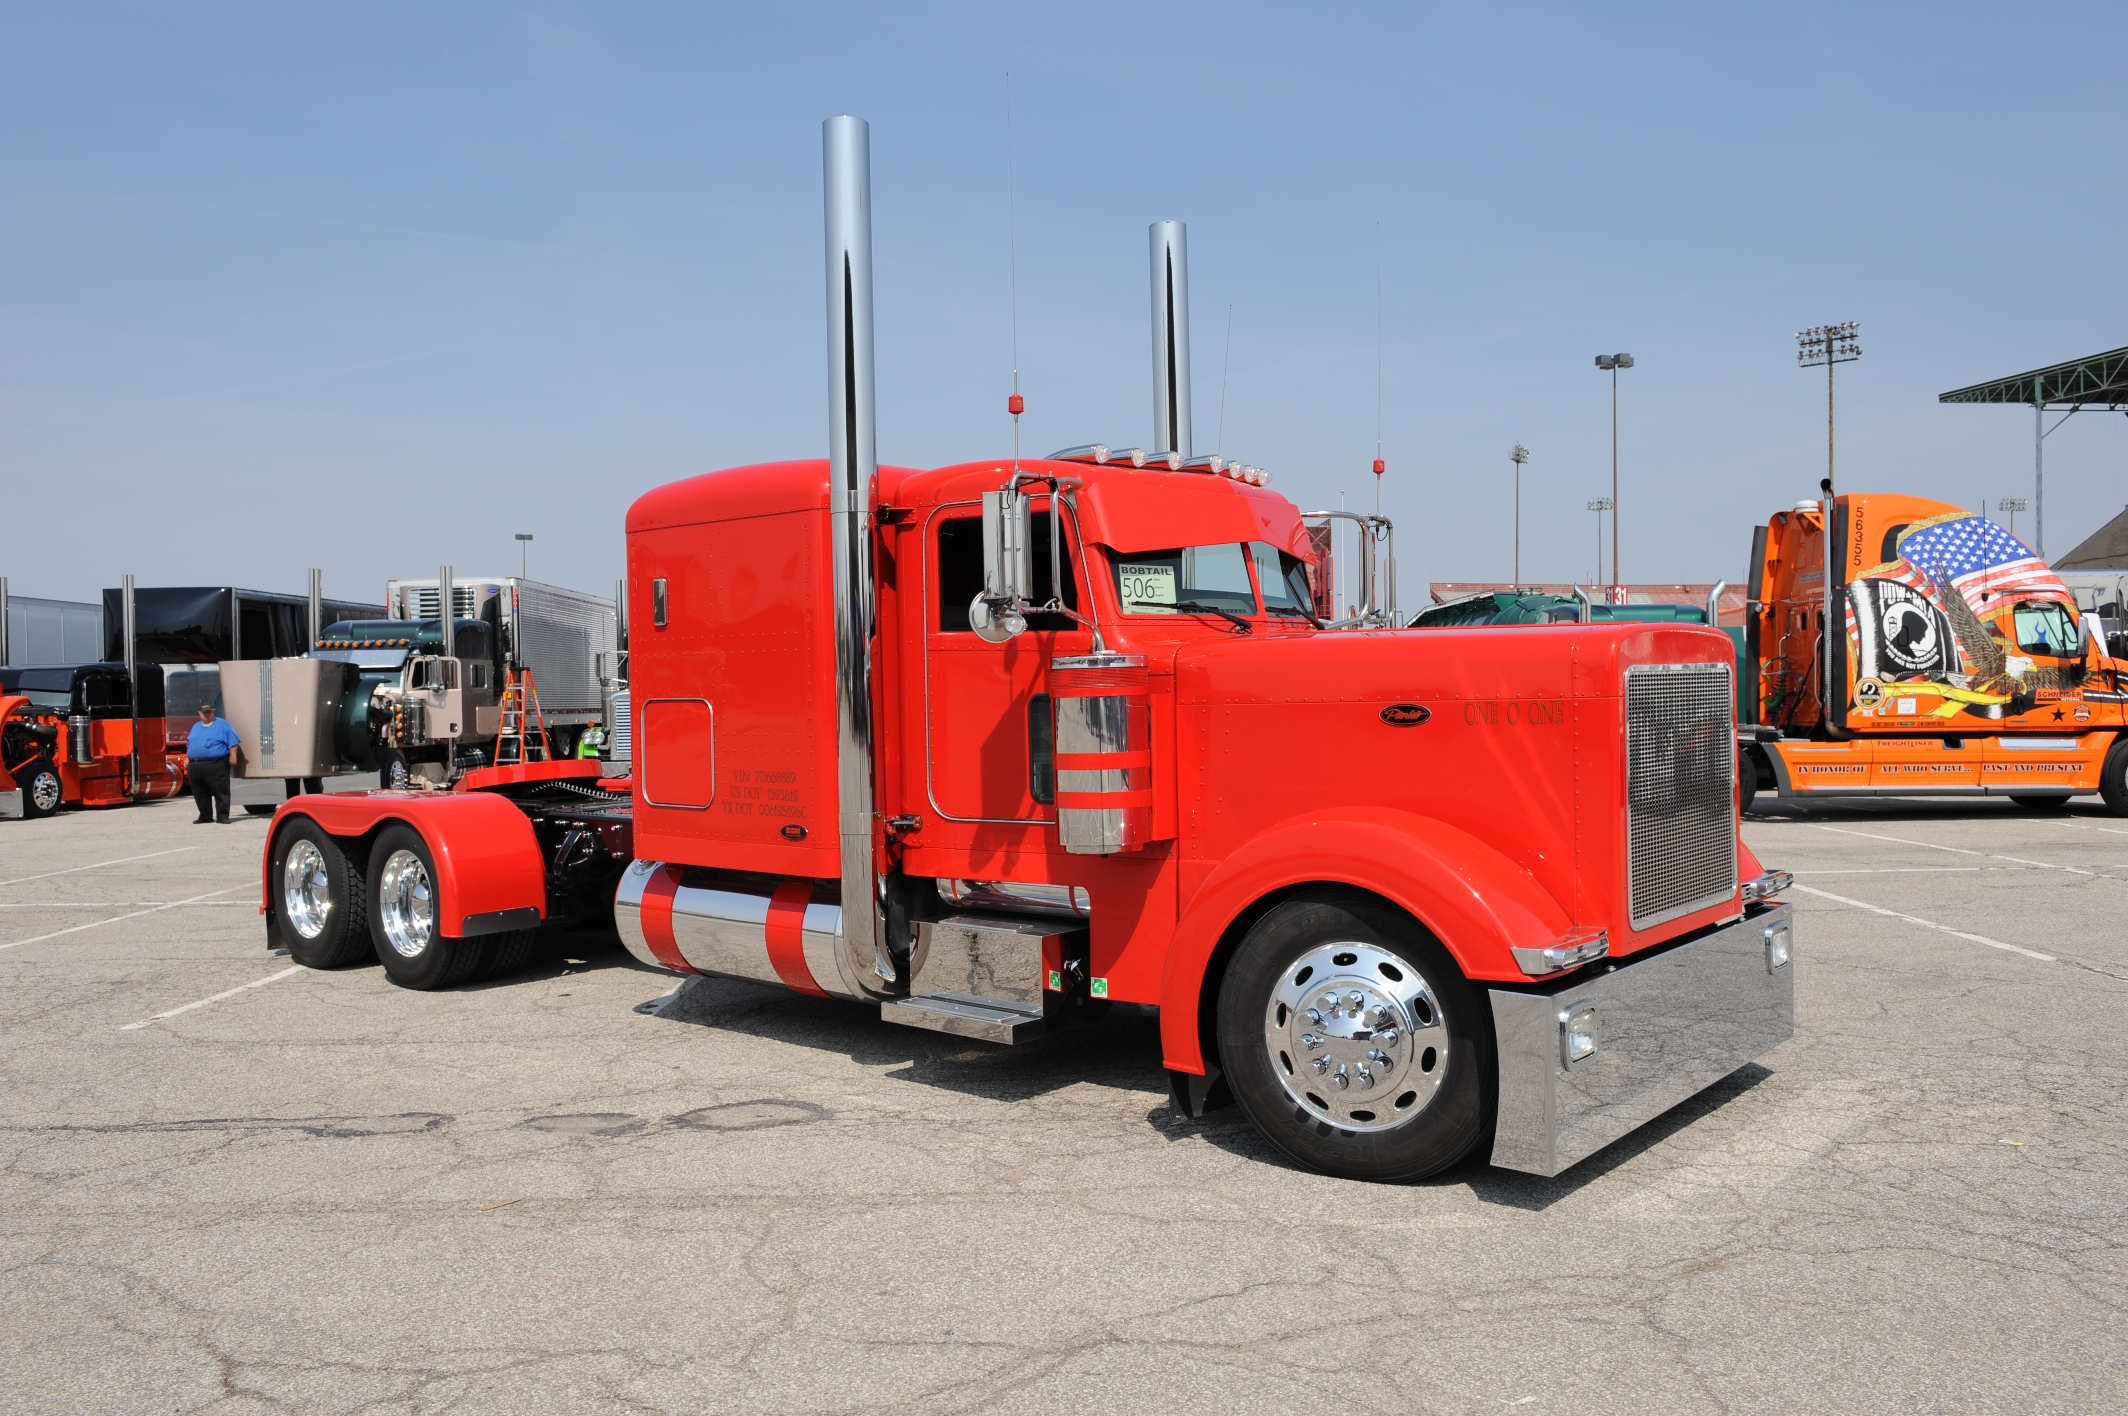 Custom Semi Trucks Wallpapers   Viewing Gallery 2128x1416